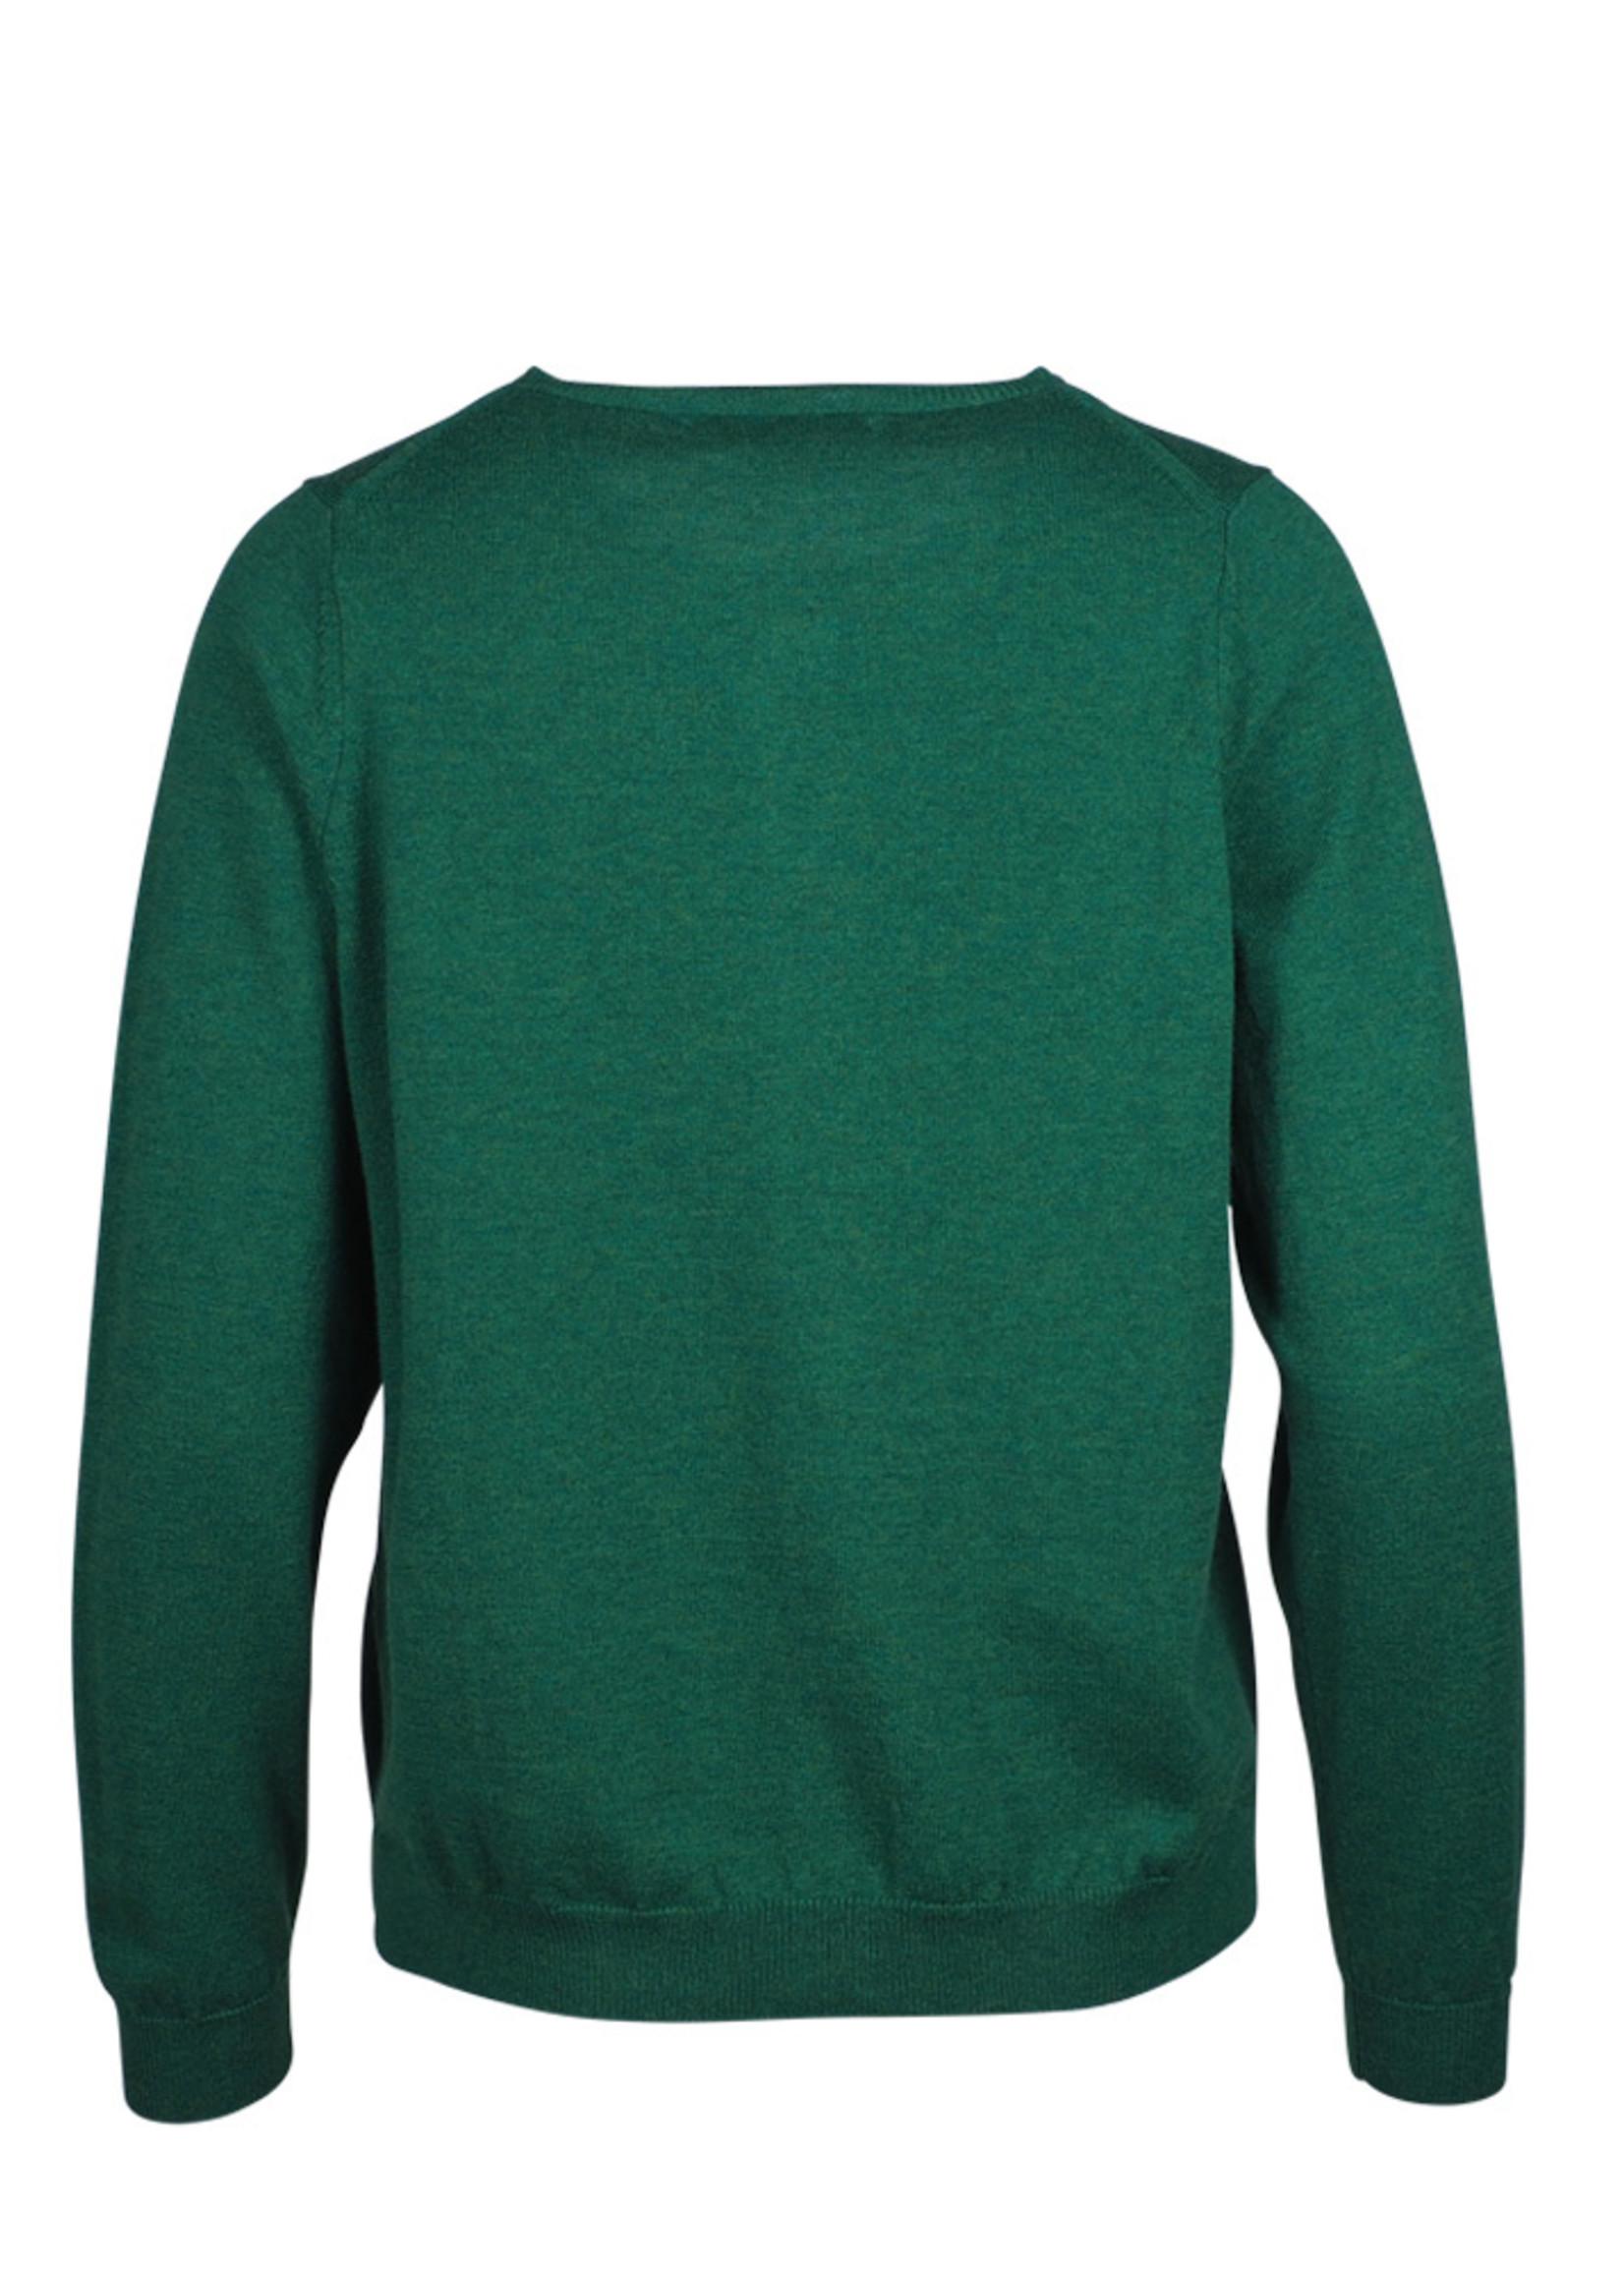 Mansted Merino Wool Cardigan